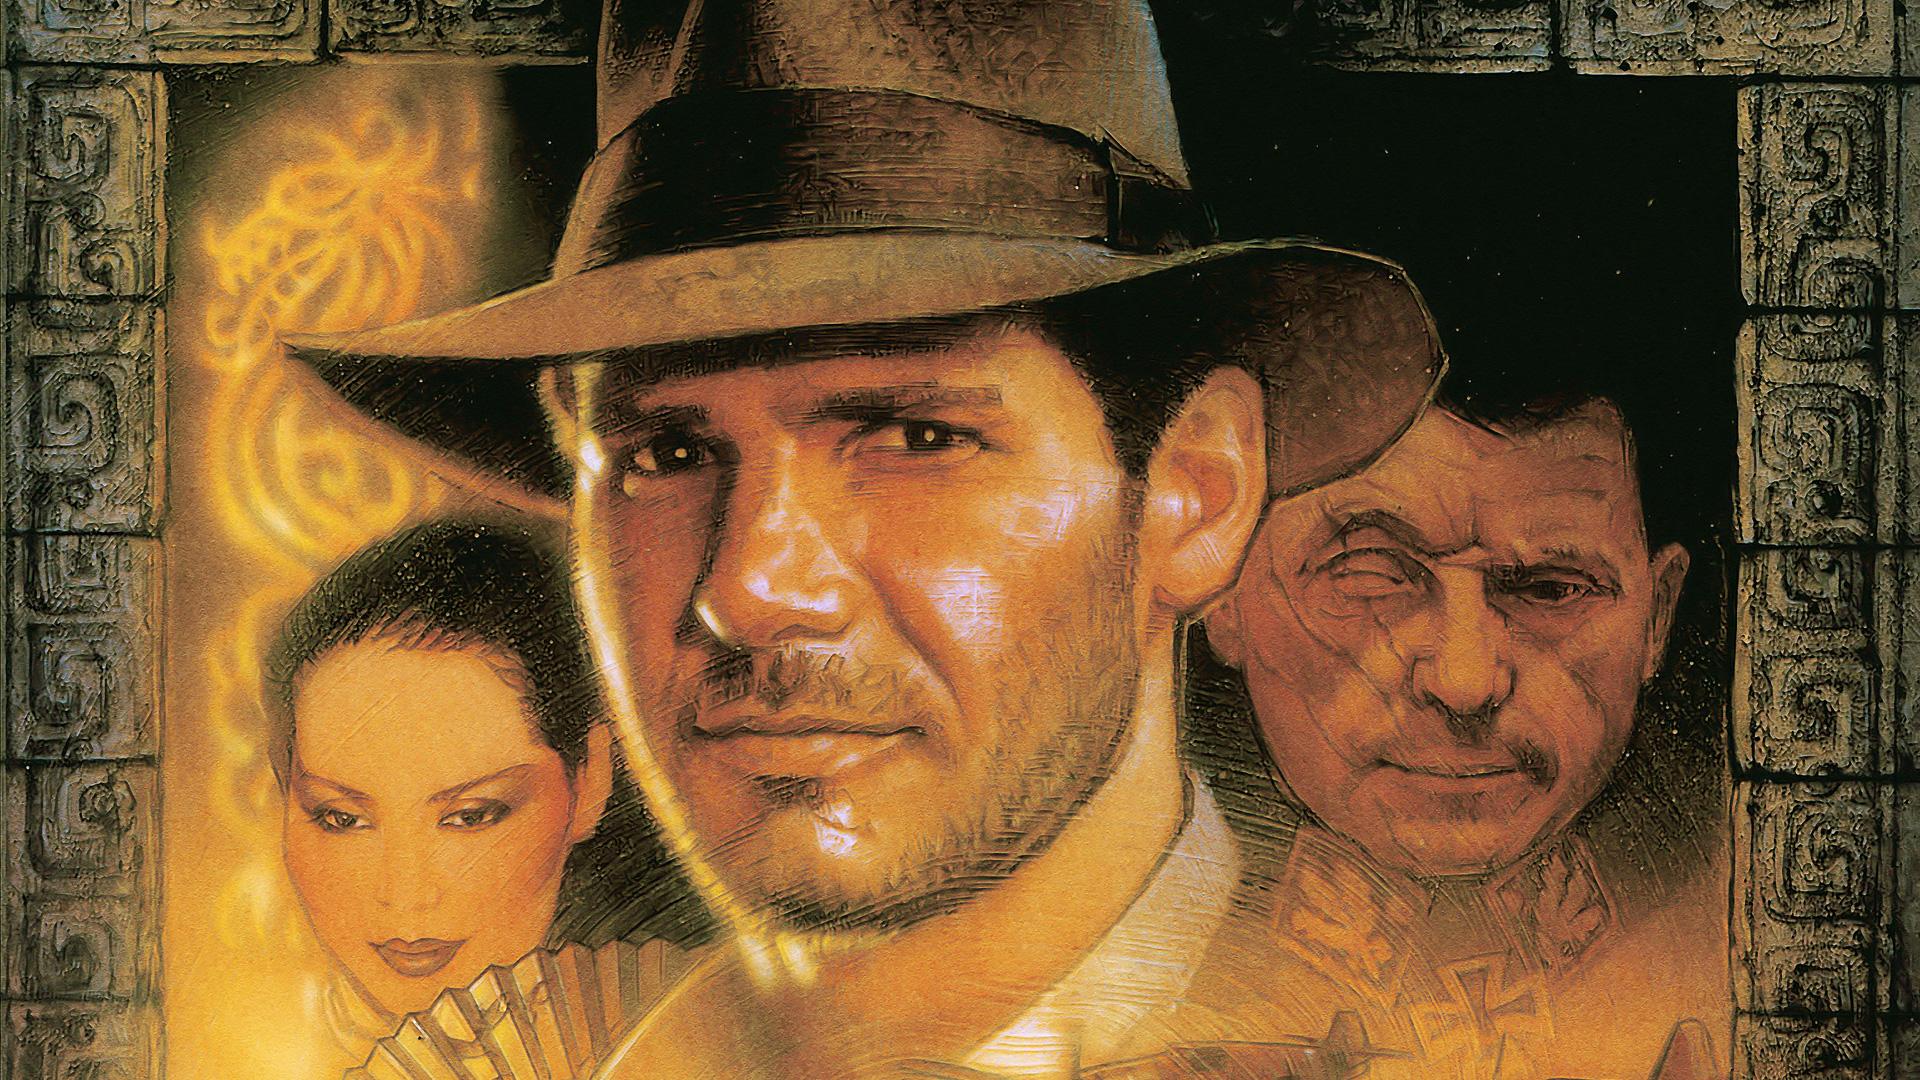 Free Indiana Jones and the Emperor's Tomb Wallpaper in 1920x1080